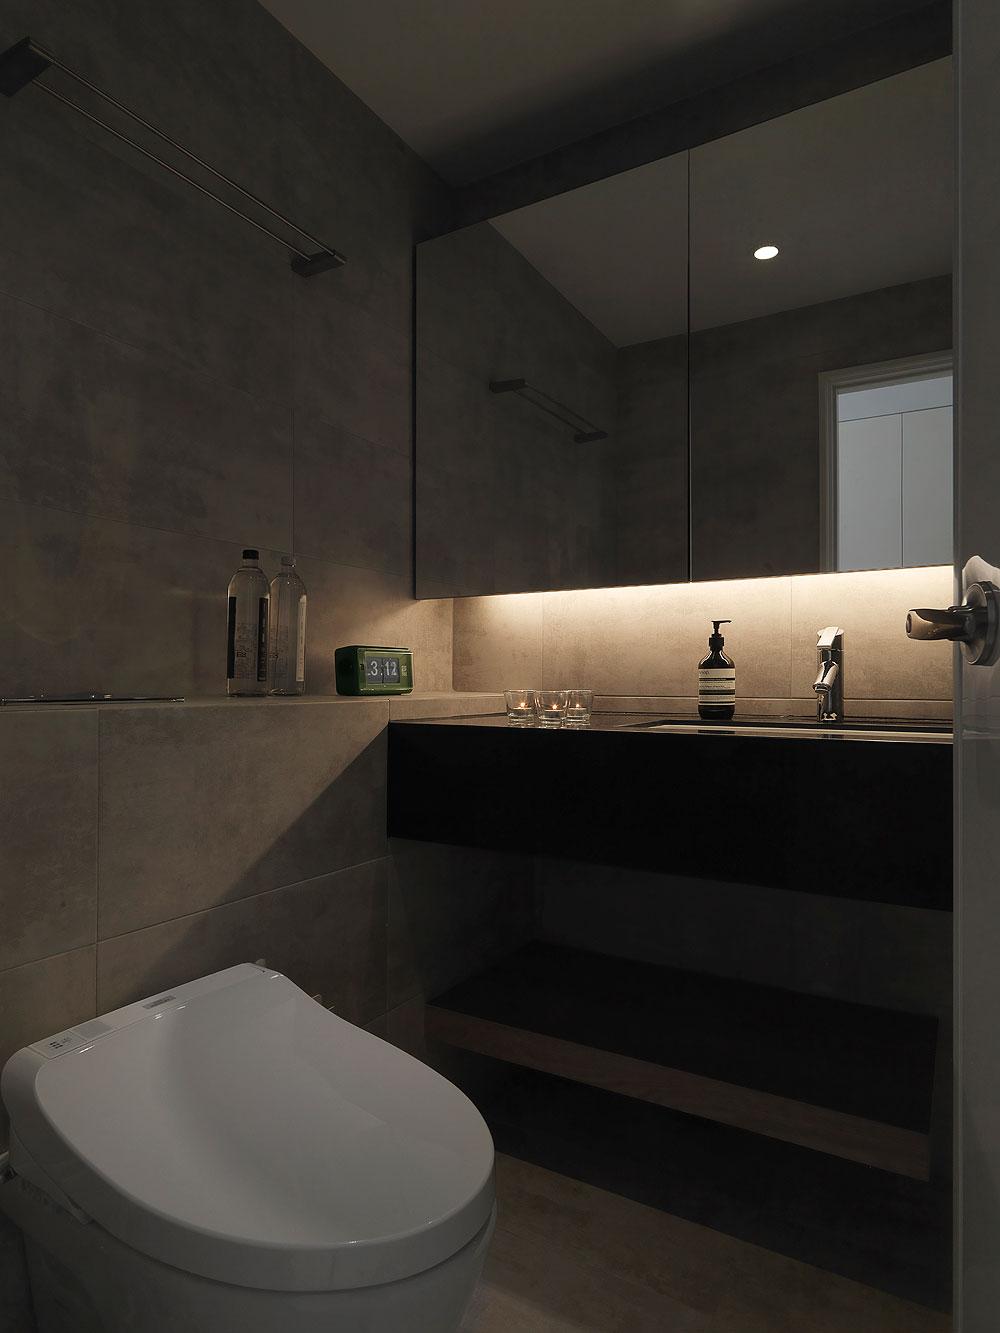 h-residence-z-axis-design (20)